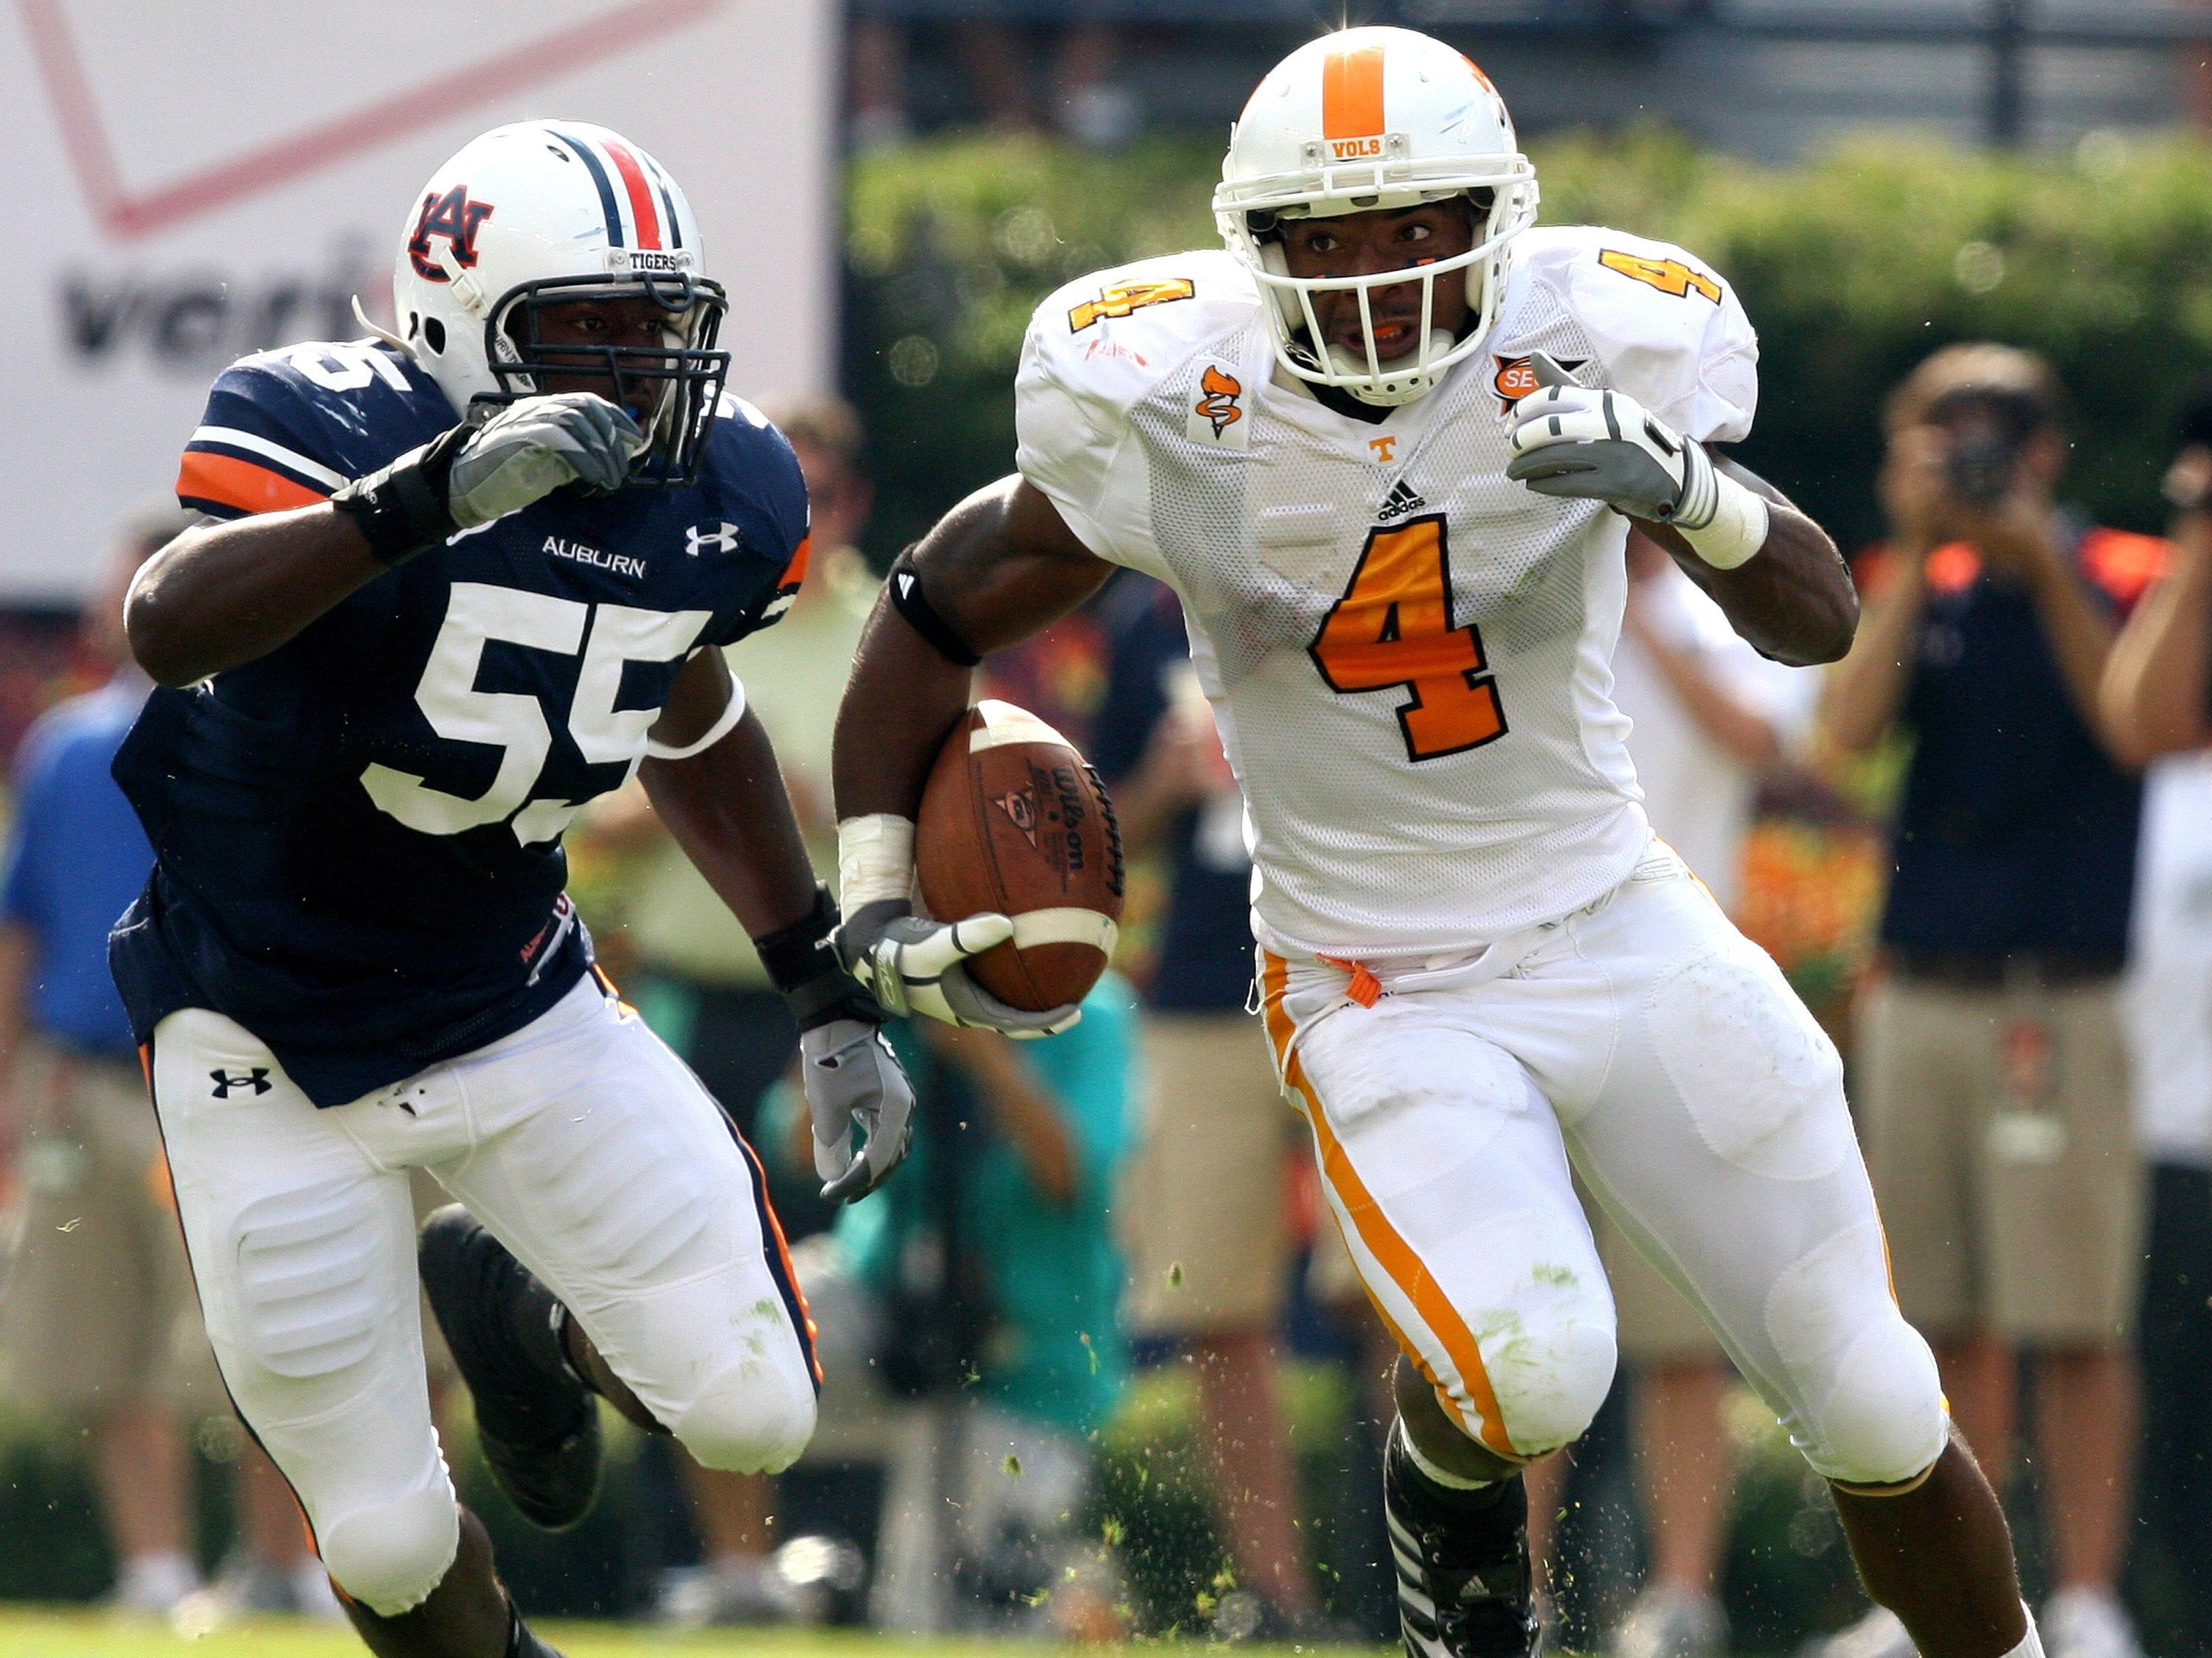 Tennessee wide receiver Gerald Jones (4) runs past Auburn linebacker Merrill Johnson (55) in the first half of an NCAA college football game in Auburn, Ala., Saturday, Sept. 27, 2008.